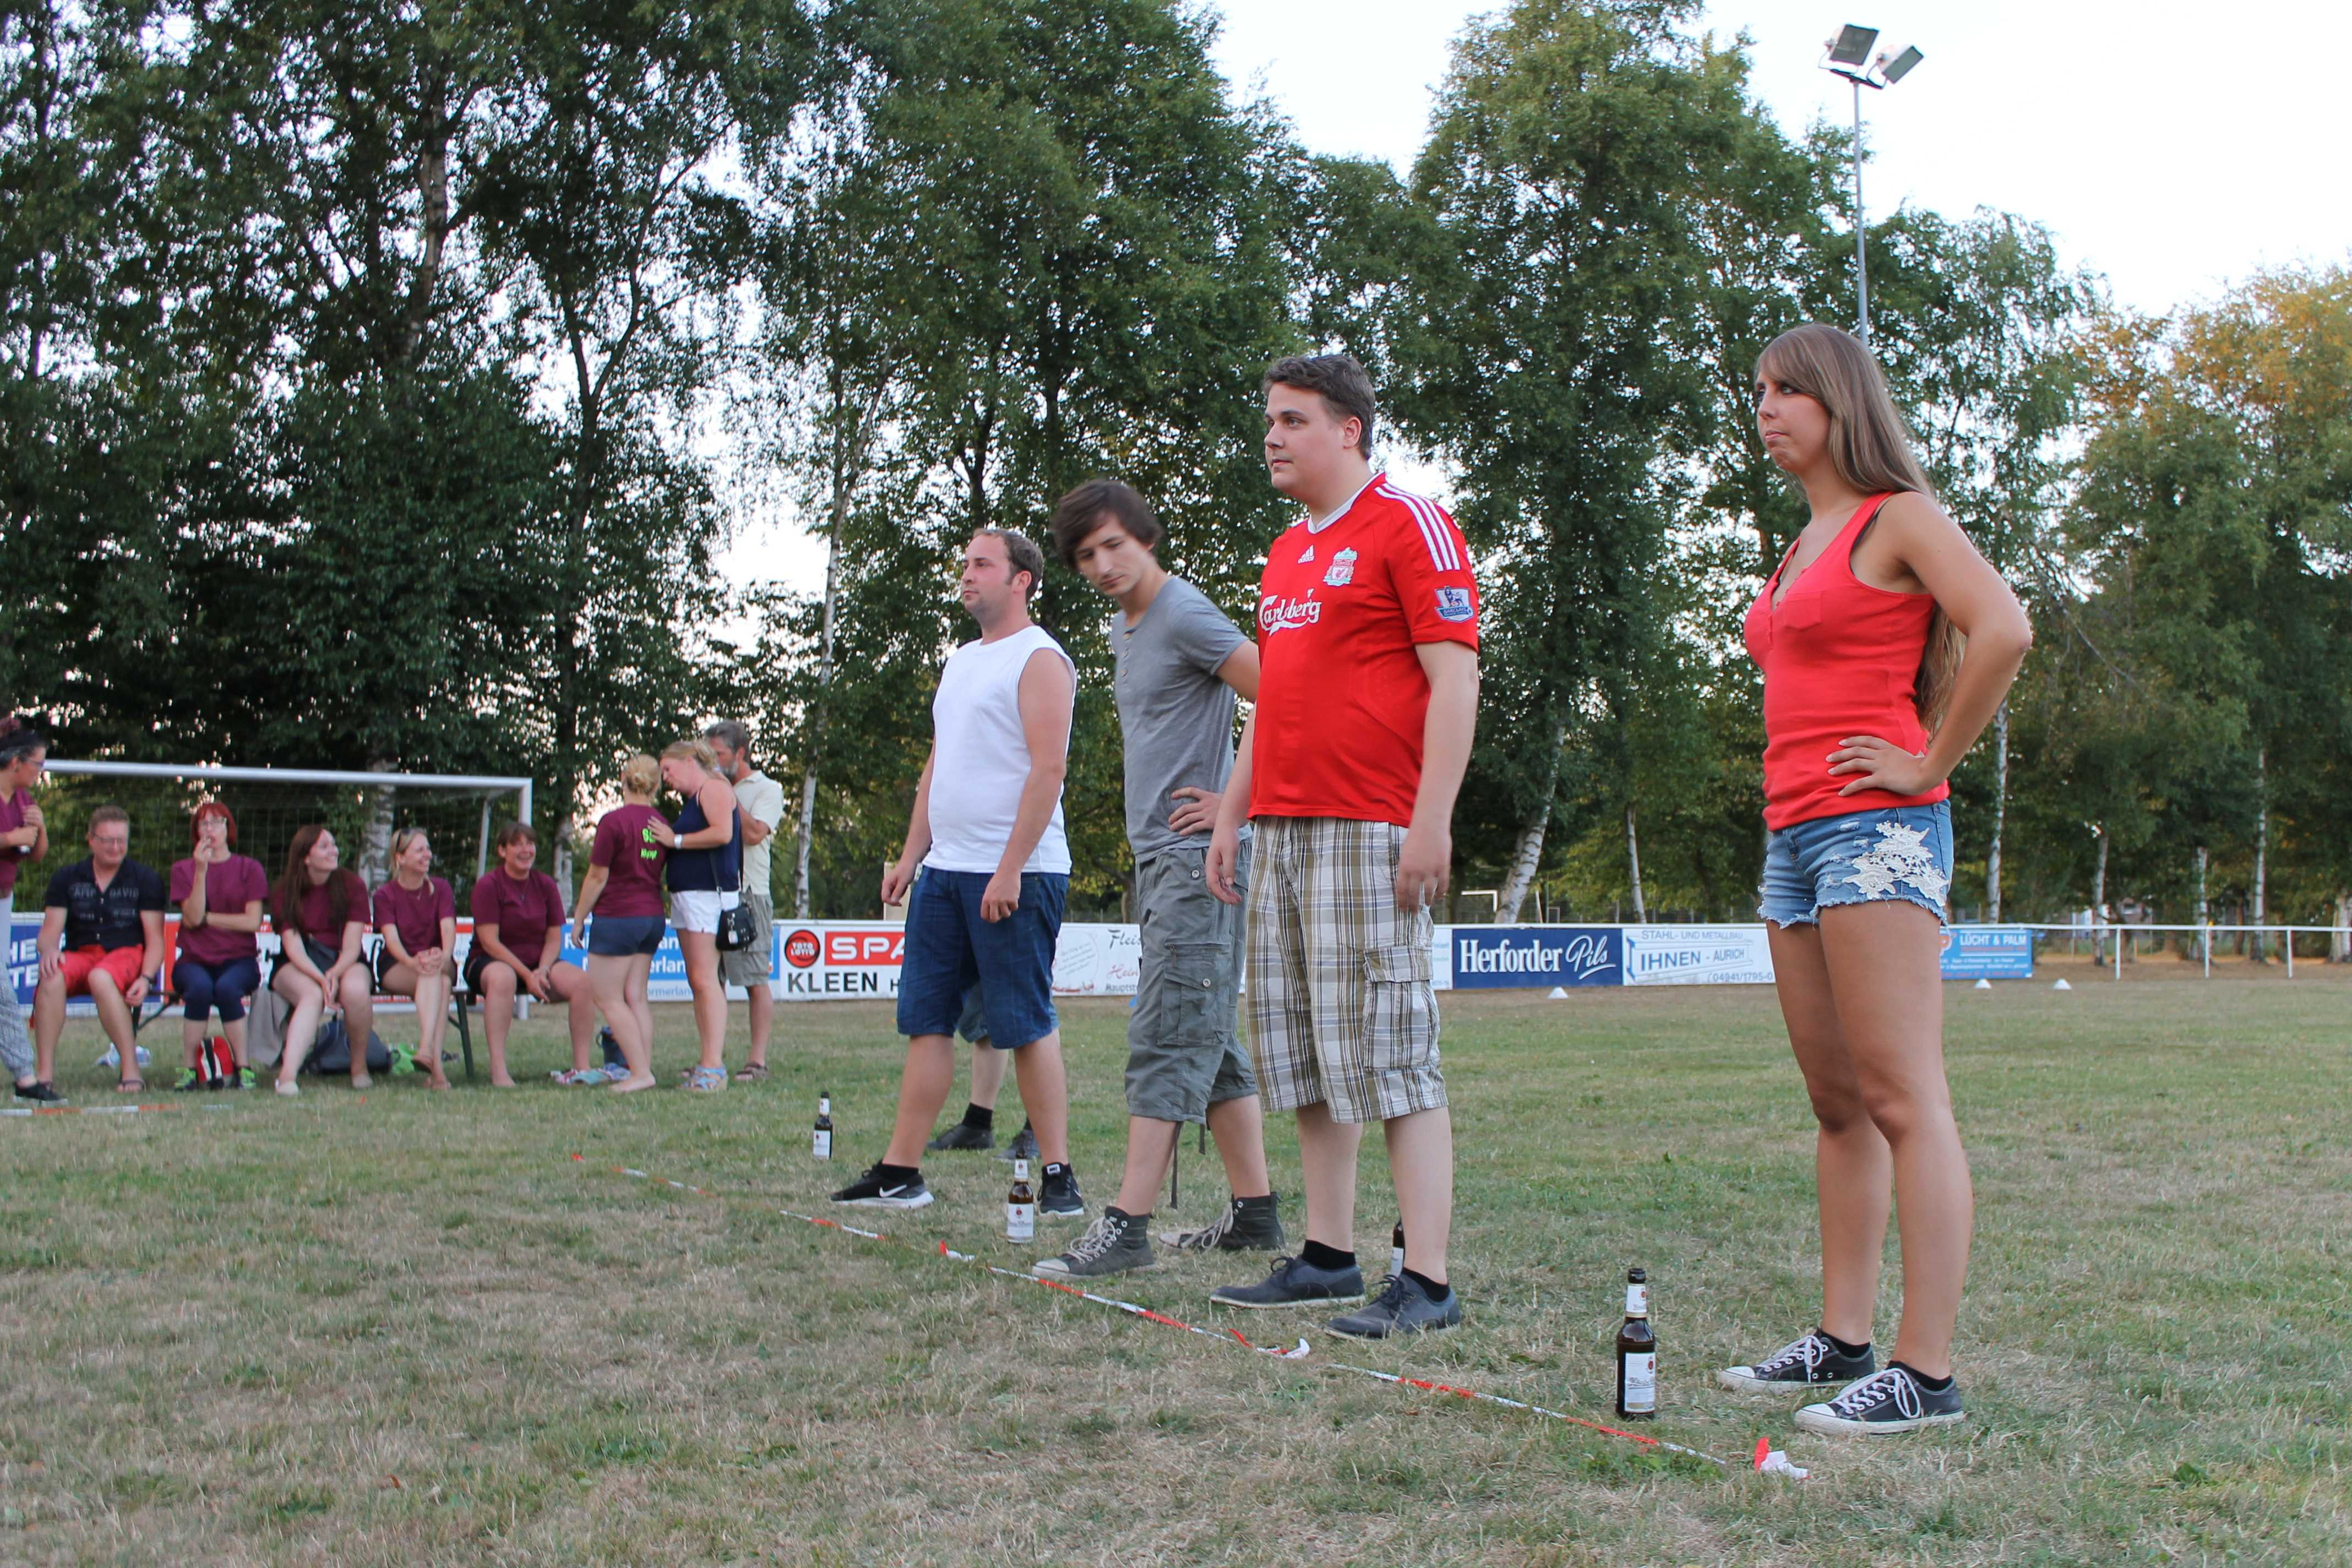 2018-07-27 Sportwoche - Flunkyball Turnier (61)